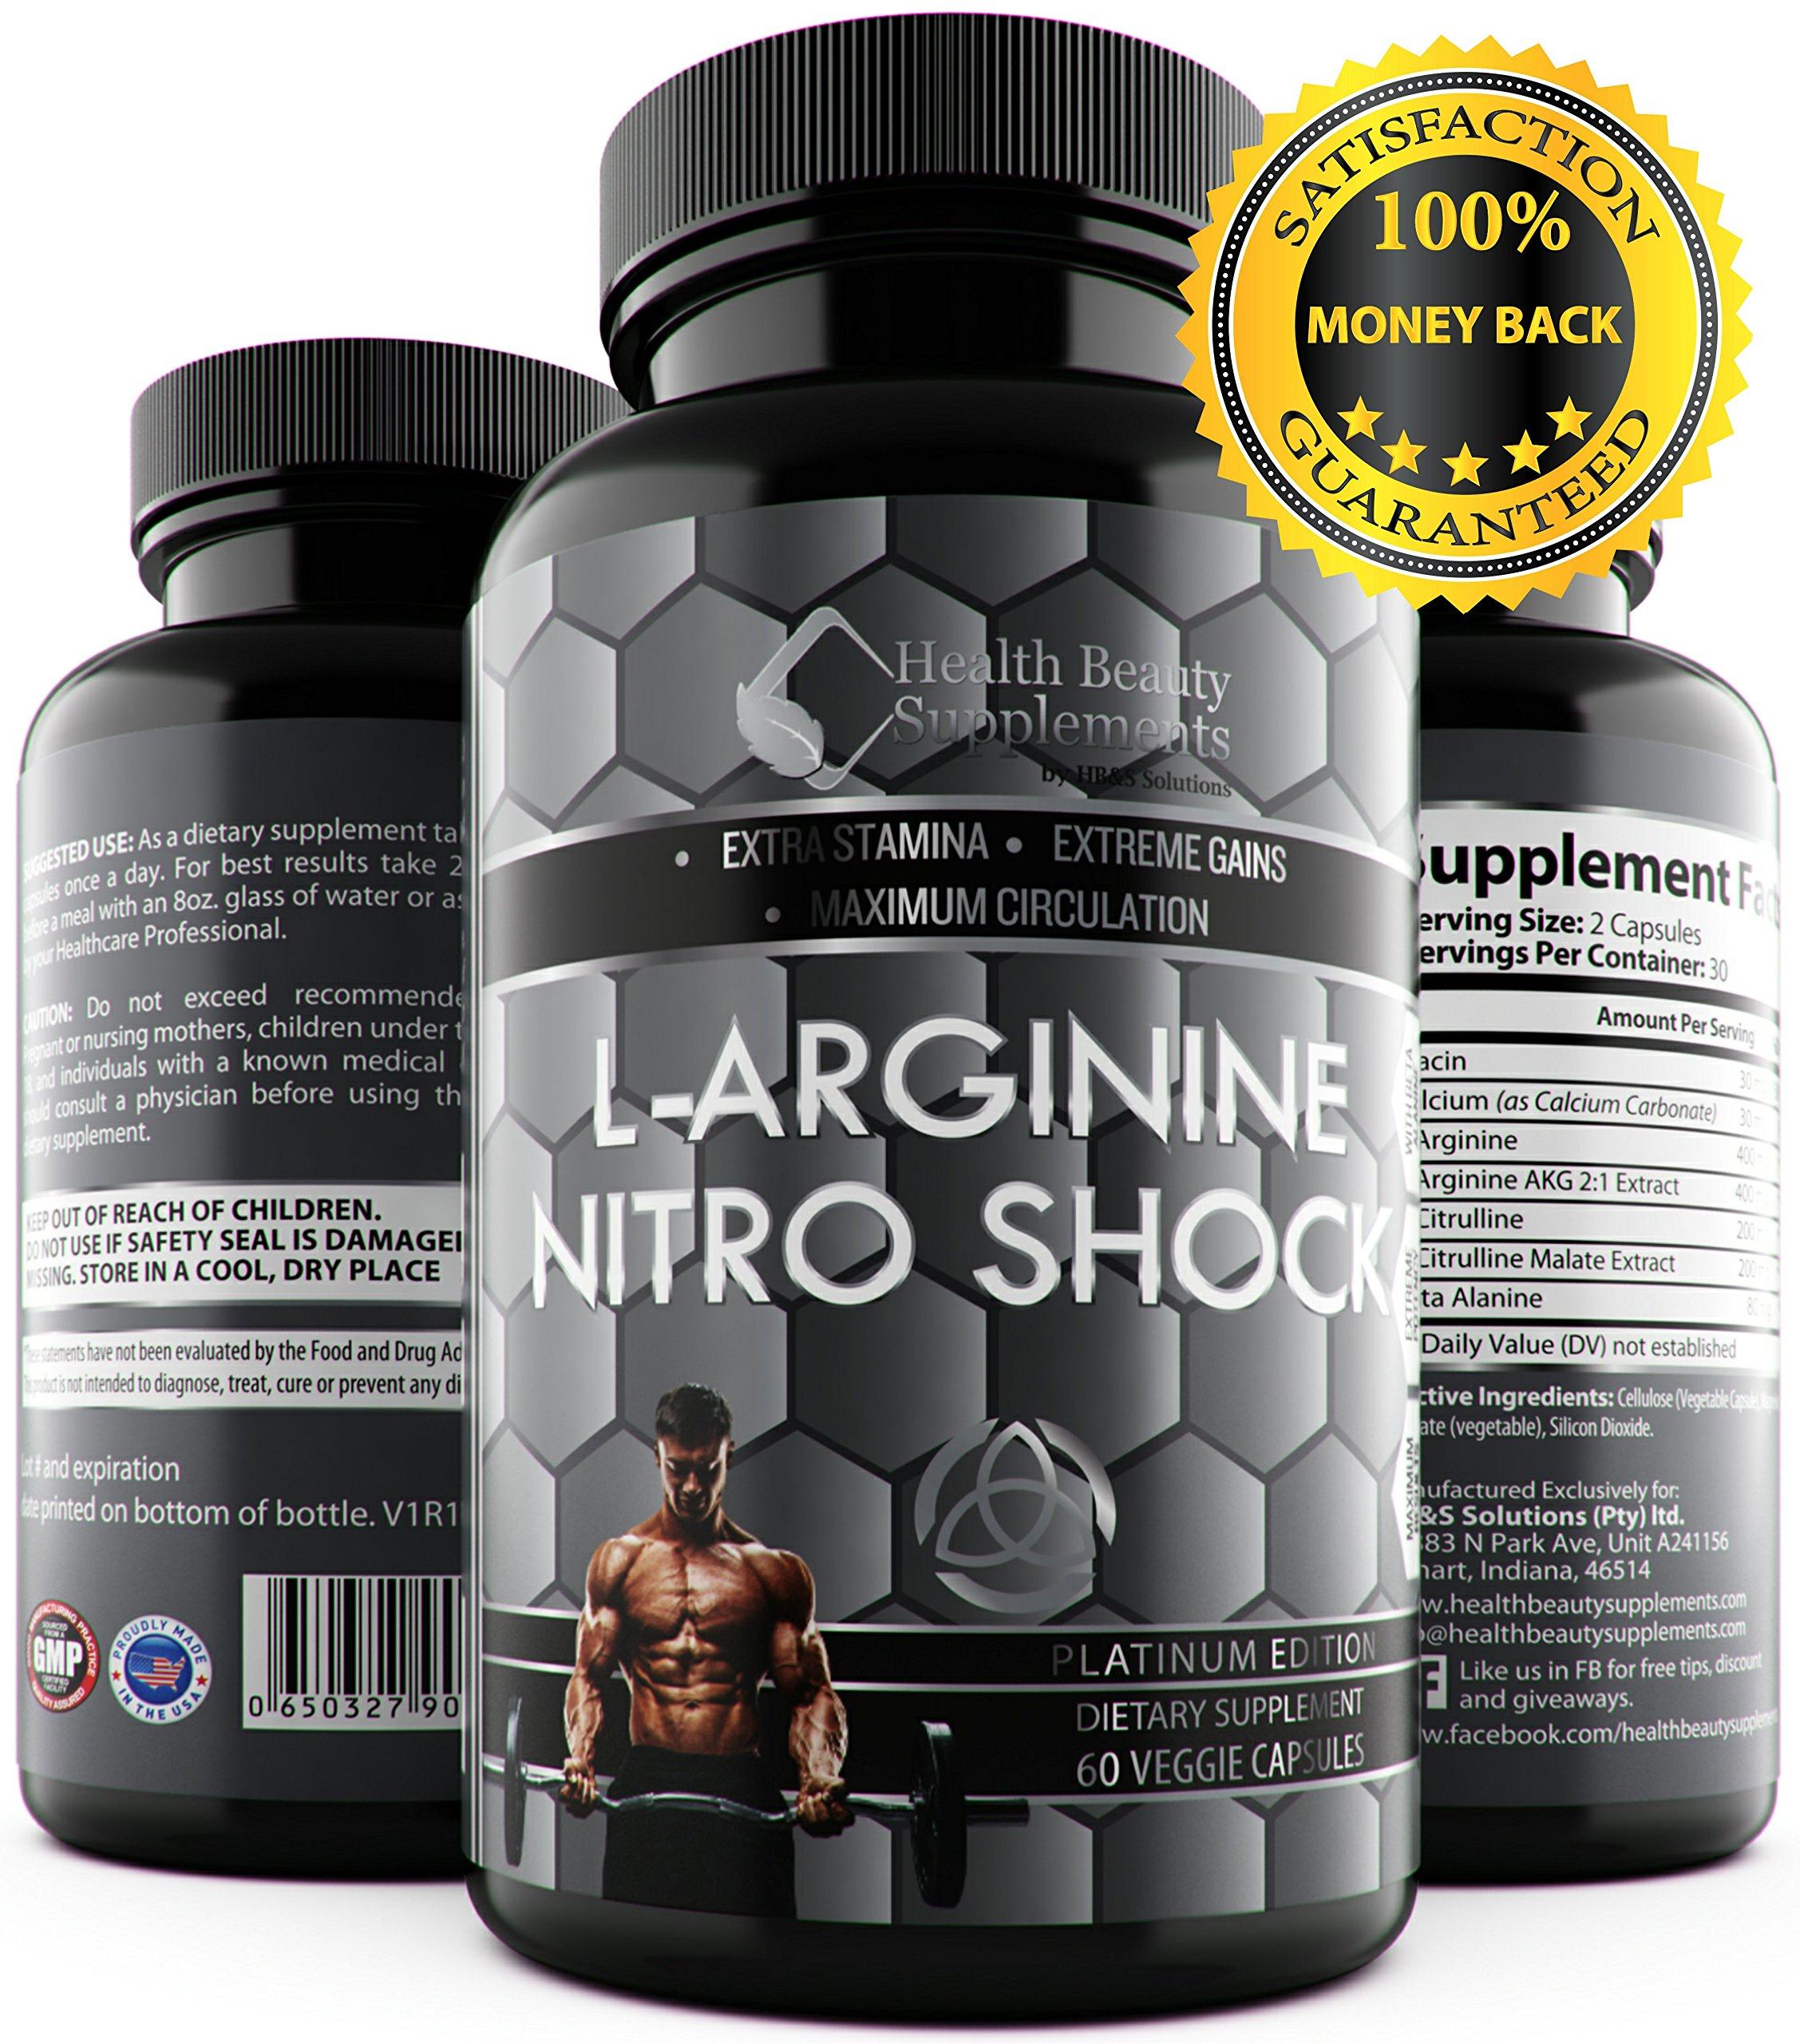 * MUSCLE PHASE L-ARGININE NITRO SHOCK PLUS * Advanced Formula Enhances Muscle Growth – Increase Stamina & Energy – Max Bio-Availability Max Blood Circulation - With Beta Alanine -